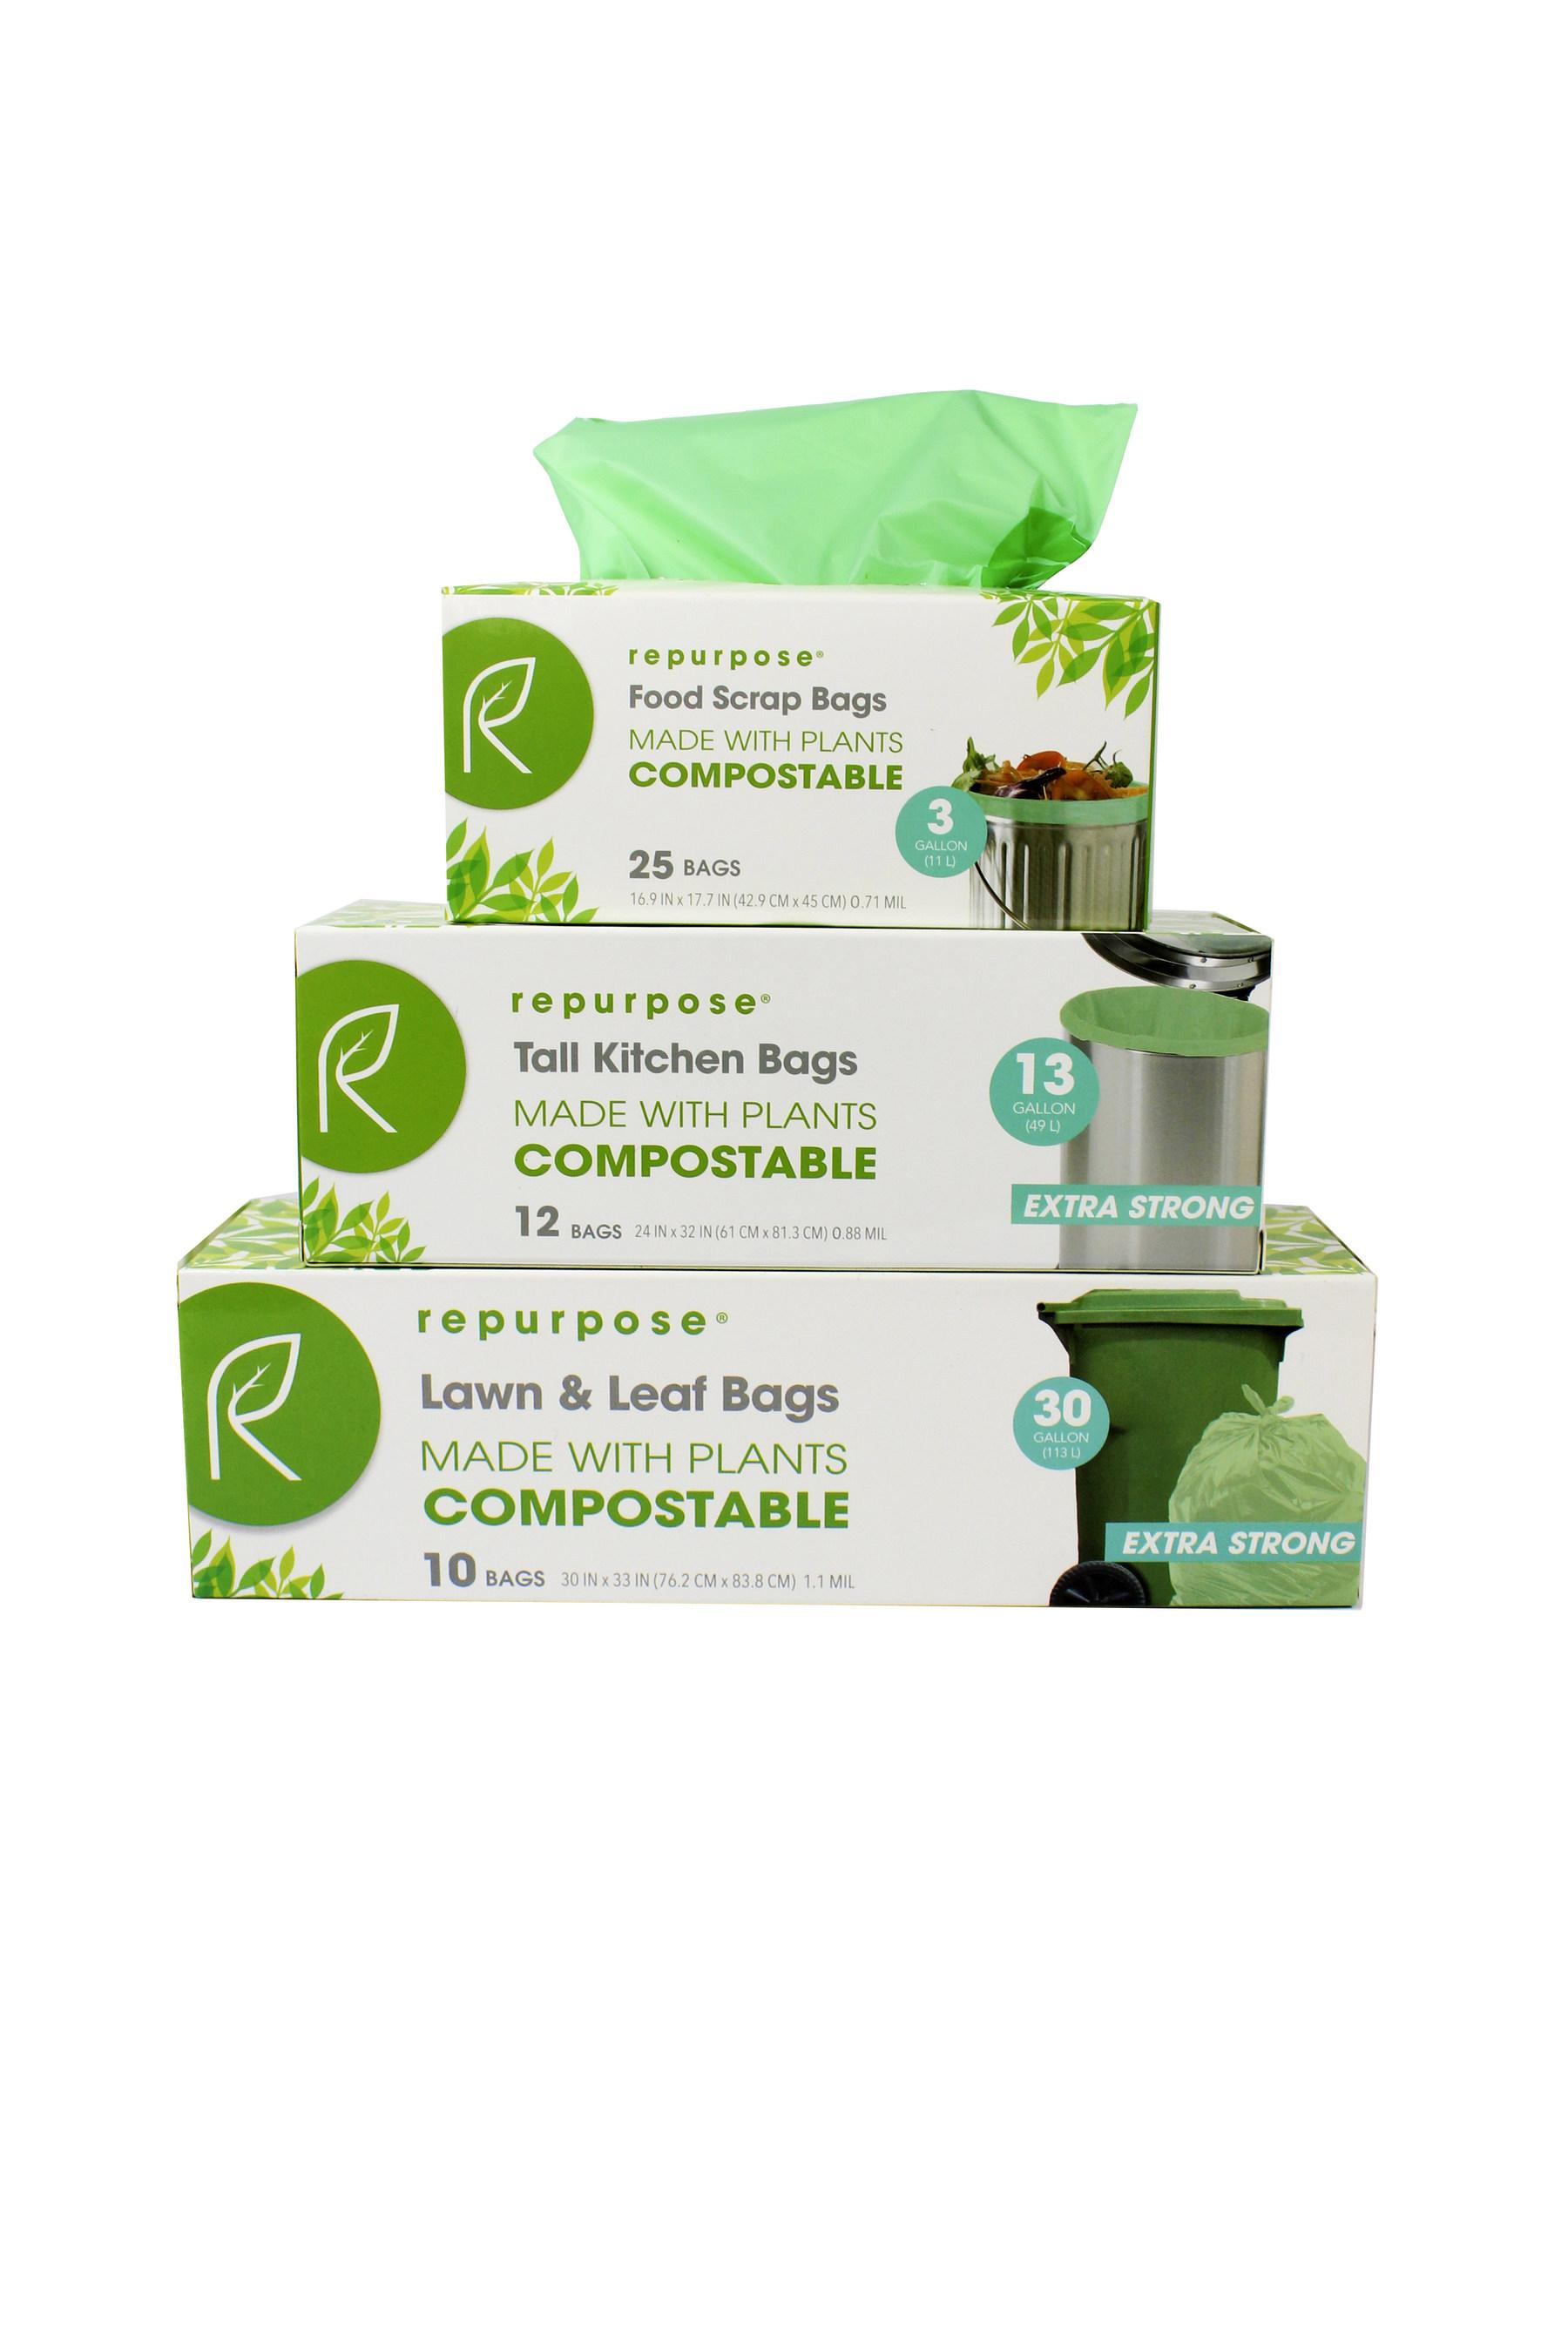 Repurpose Launches Compostable Garbage Bagskitchenware